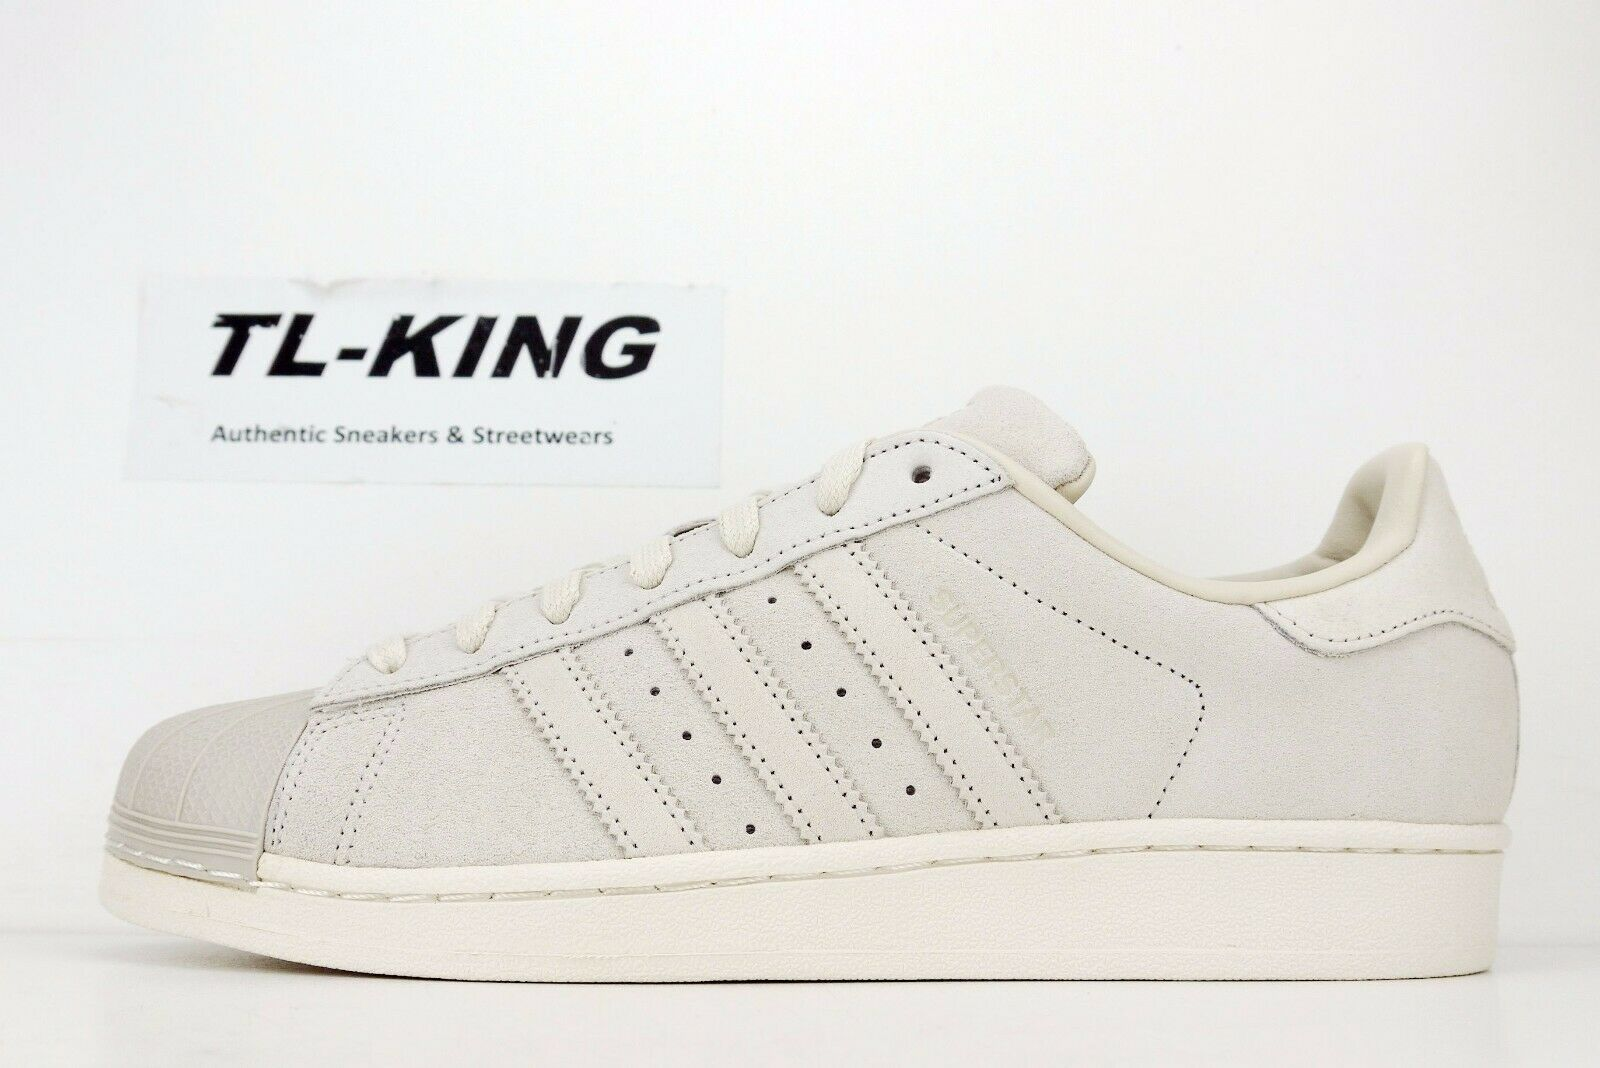 Adidas Originals Superstar Beige Brown Marcia Leather Suede Shell Toe BZ0199 FB